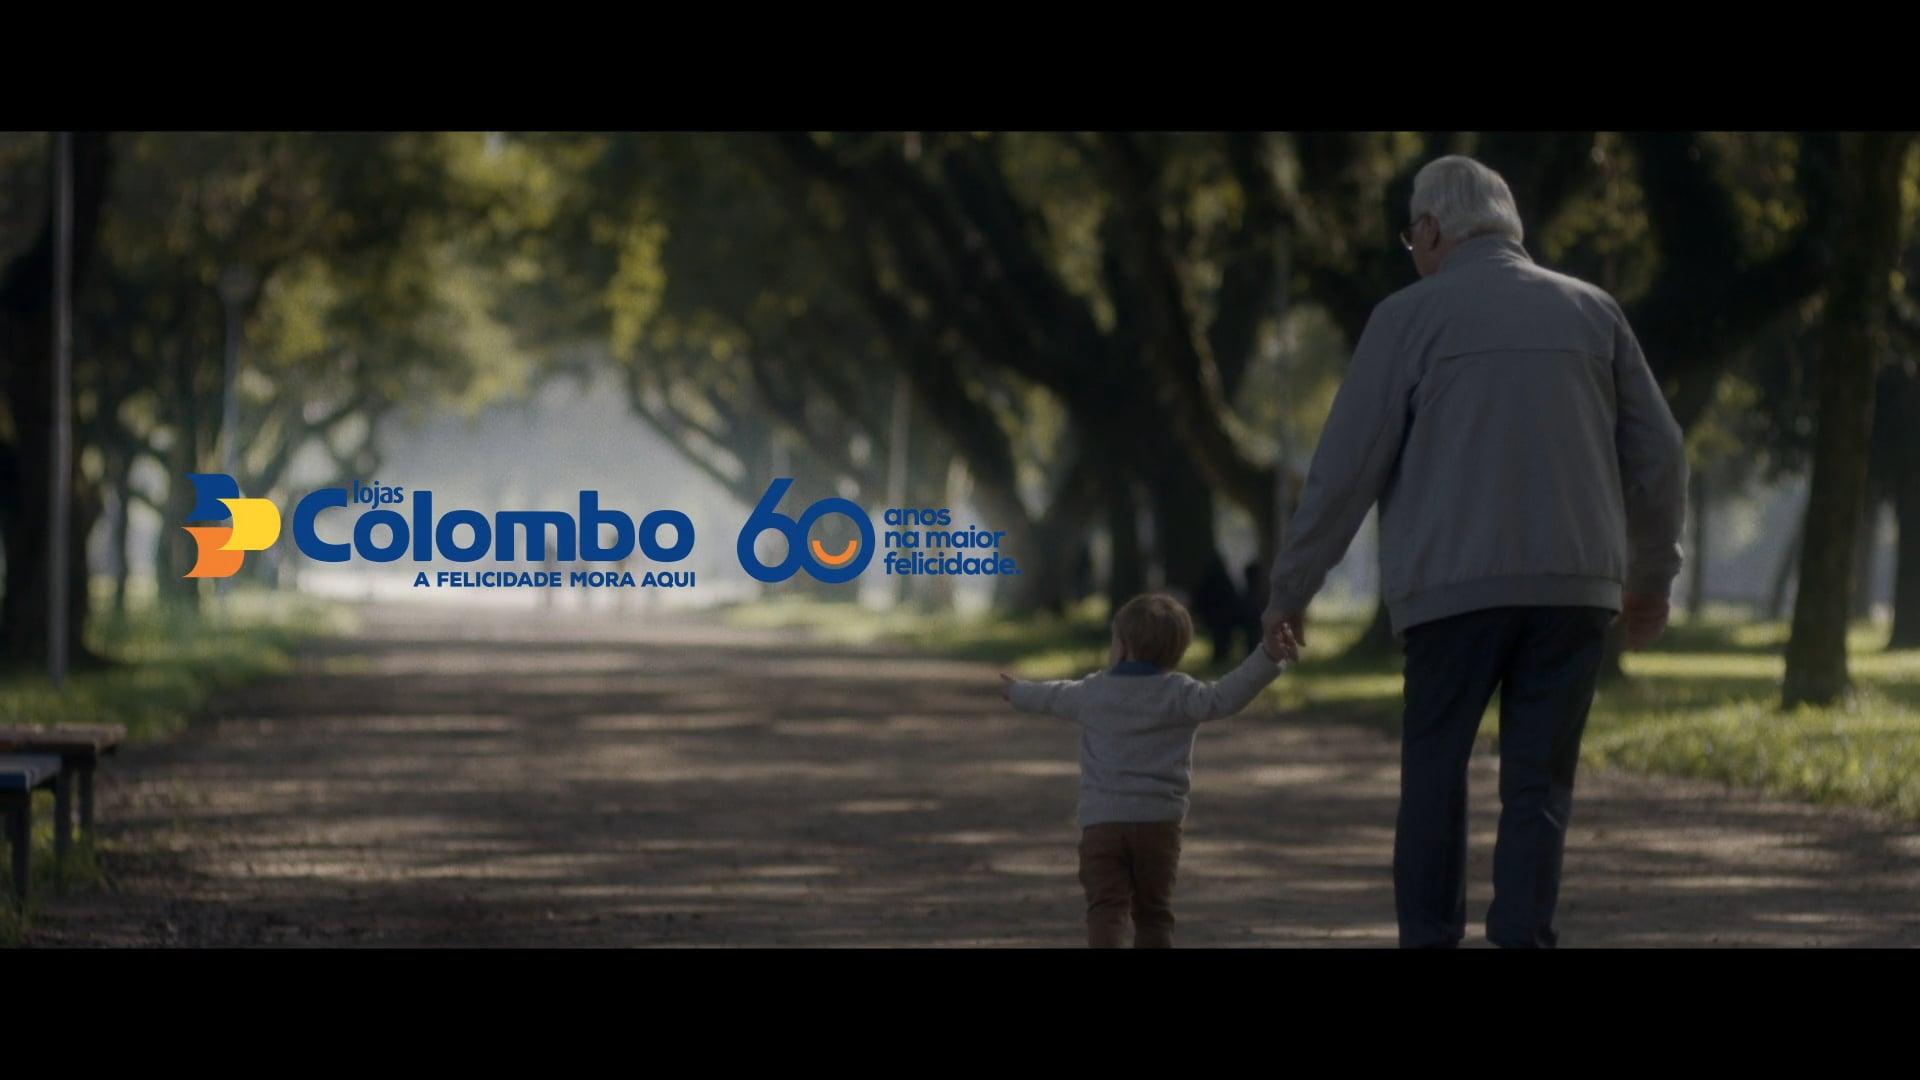 COLOMBO - 60 anos